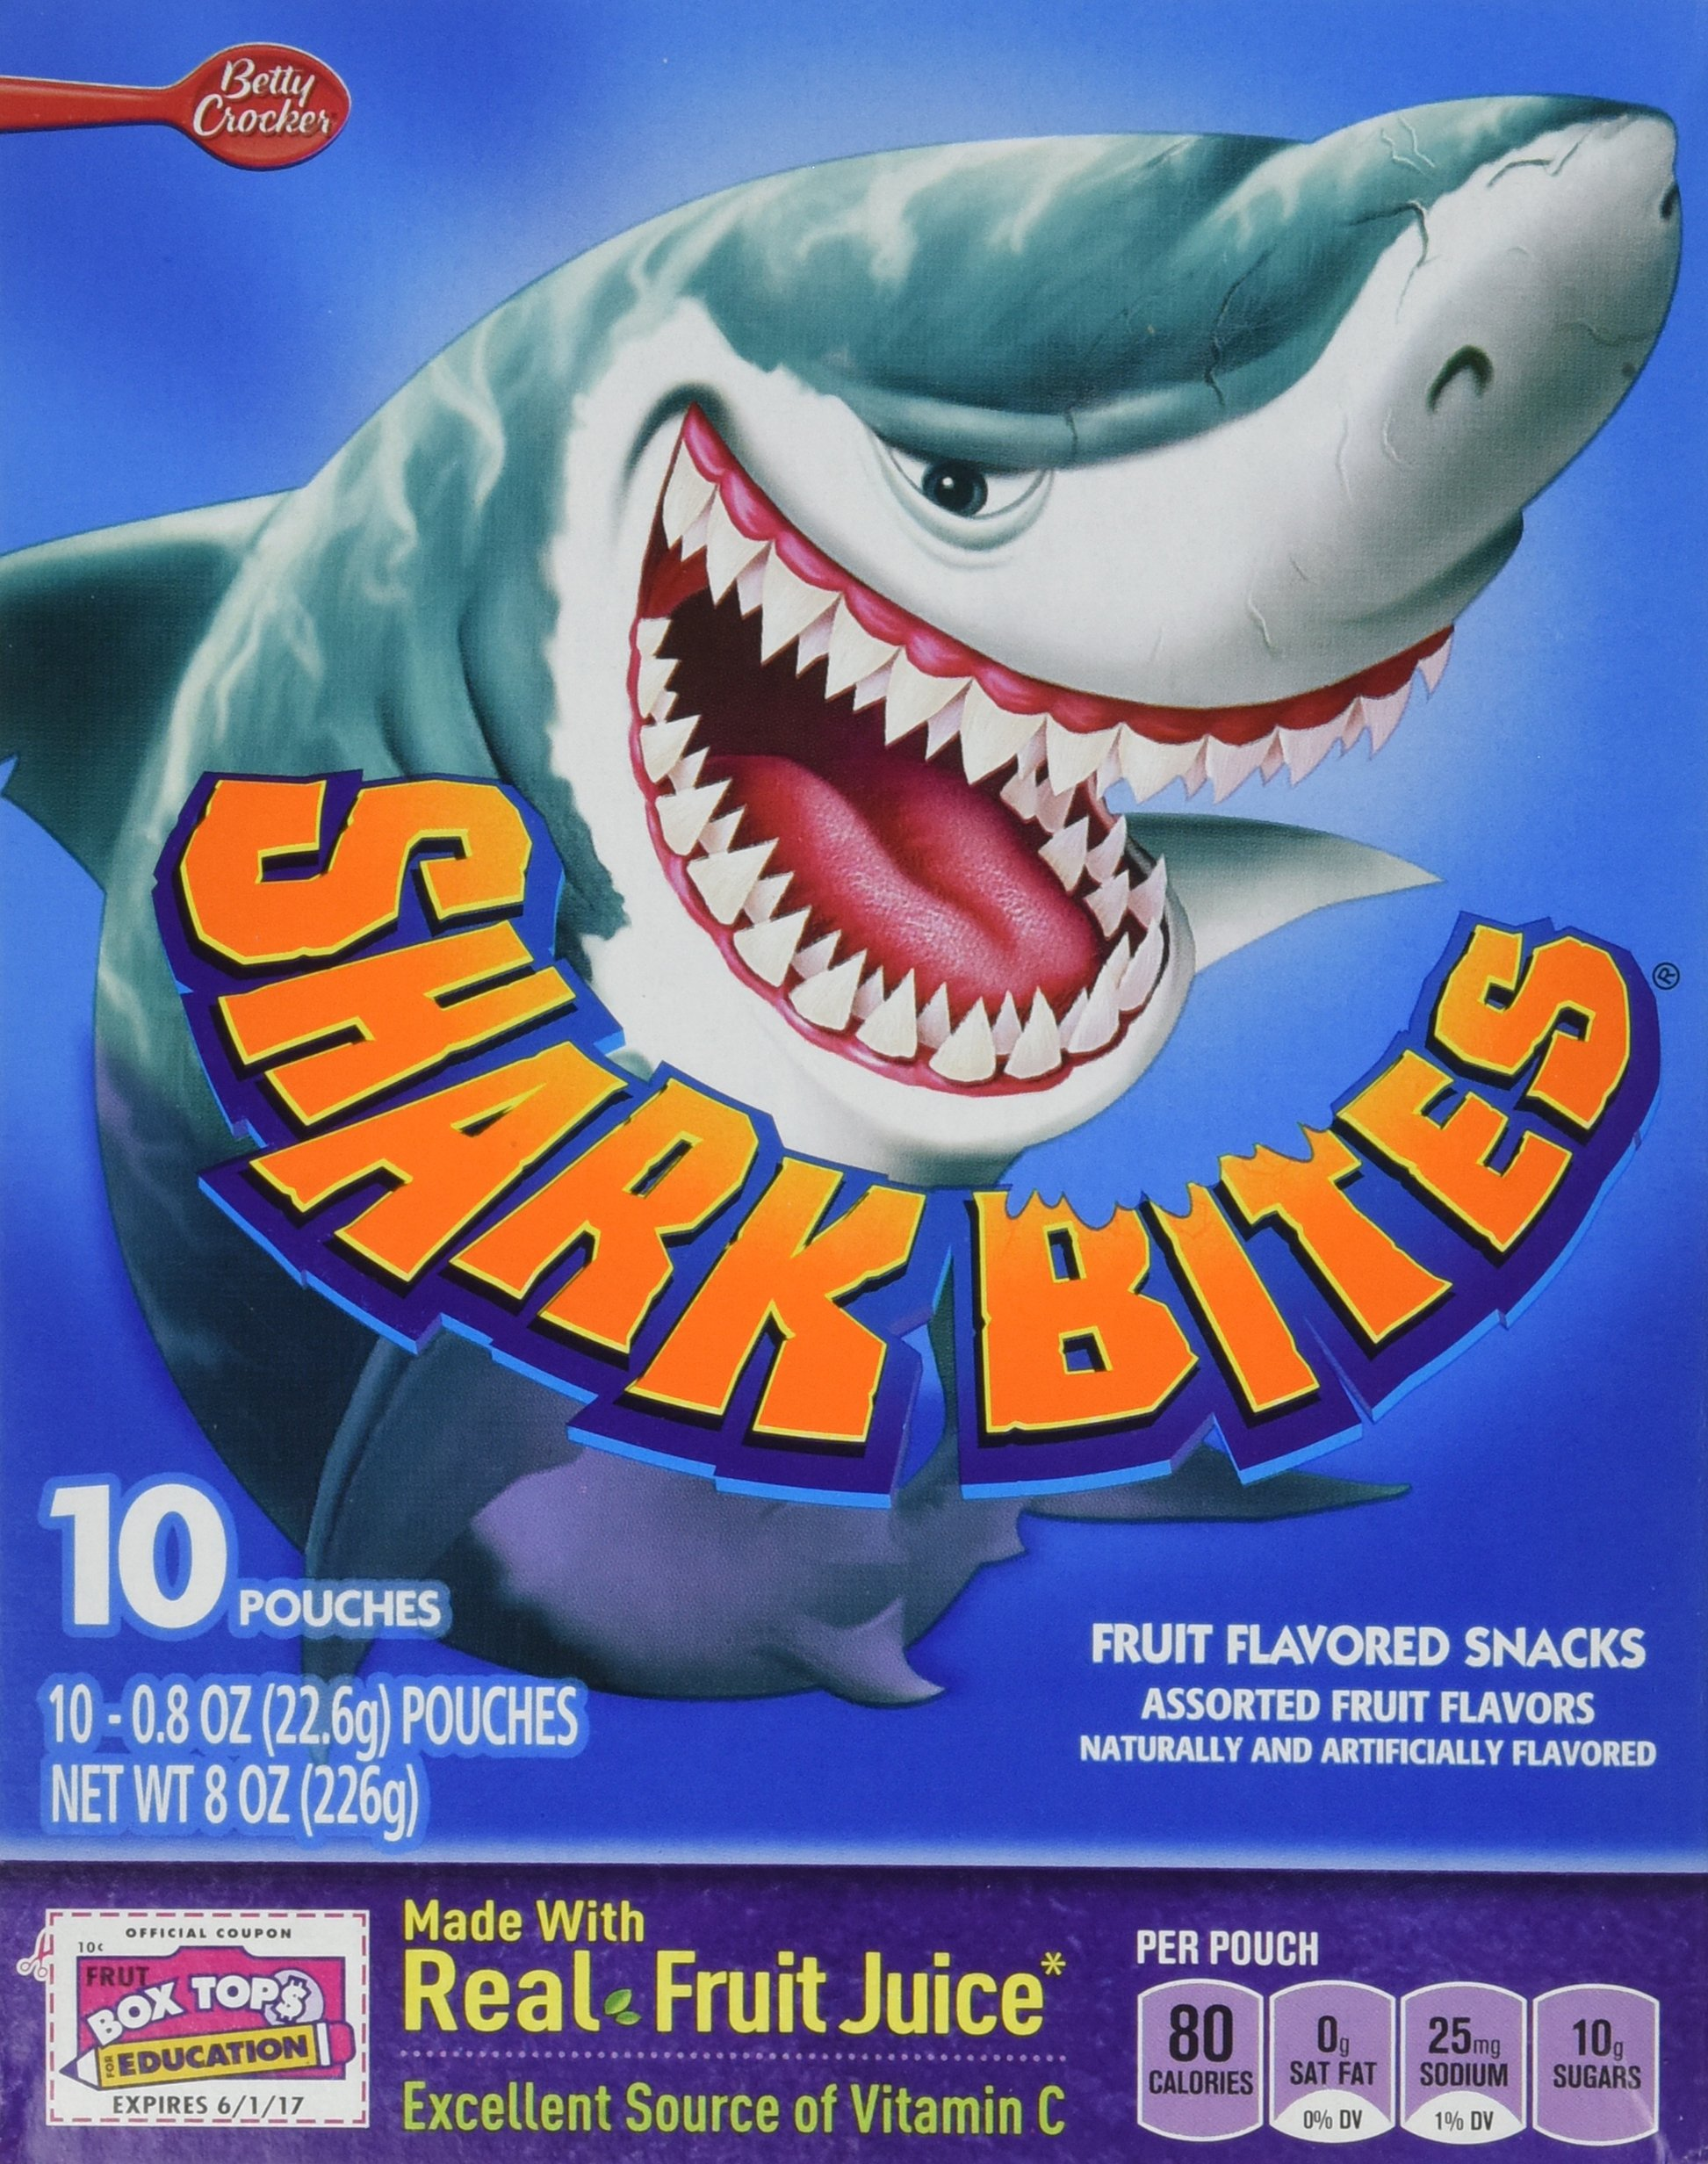 Betty Crocker Shark Bites Fruit Flavored Snacks - 8 oz box (2 Pack) by Betty Crocker (Image #1)